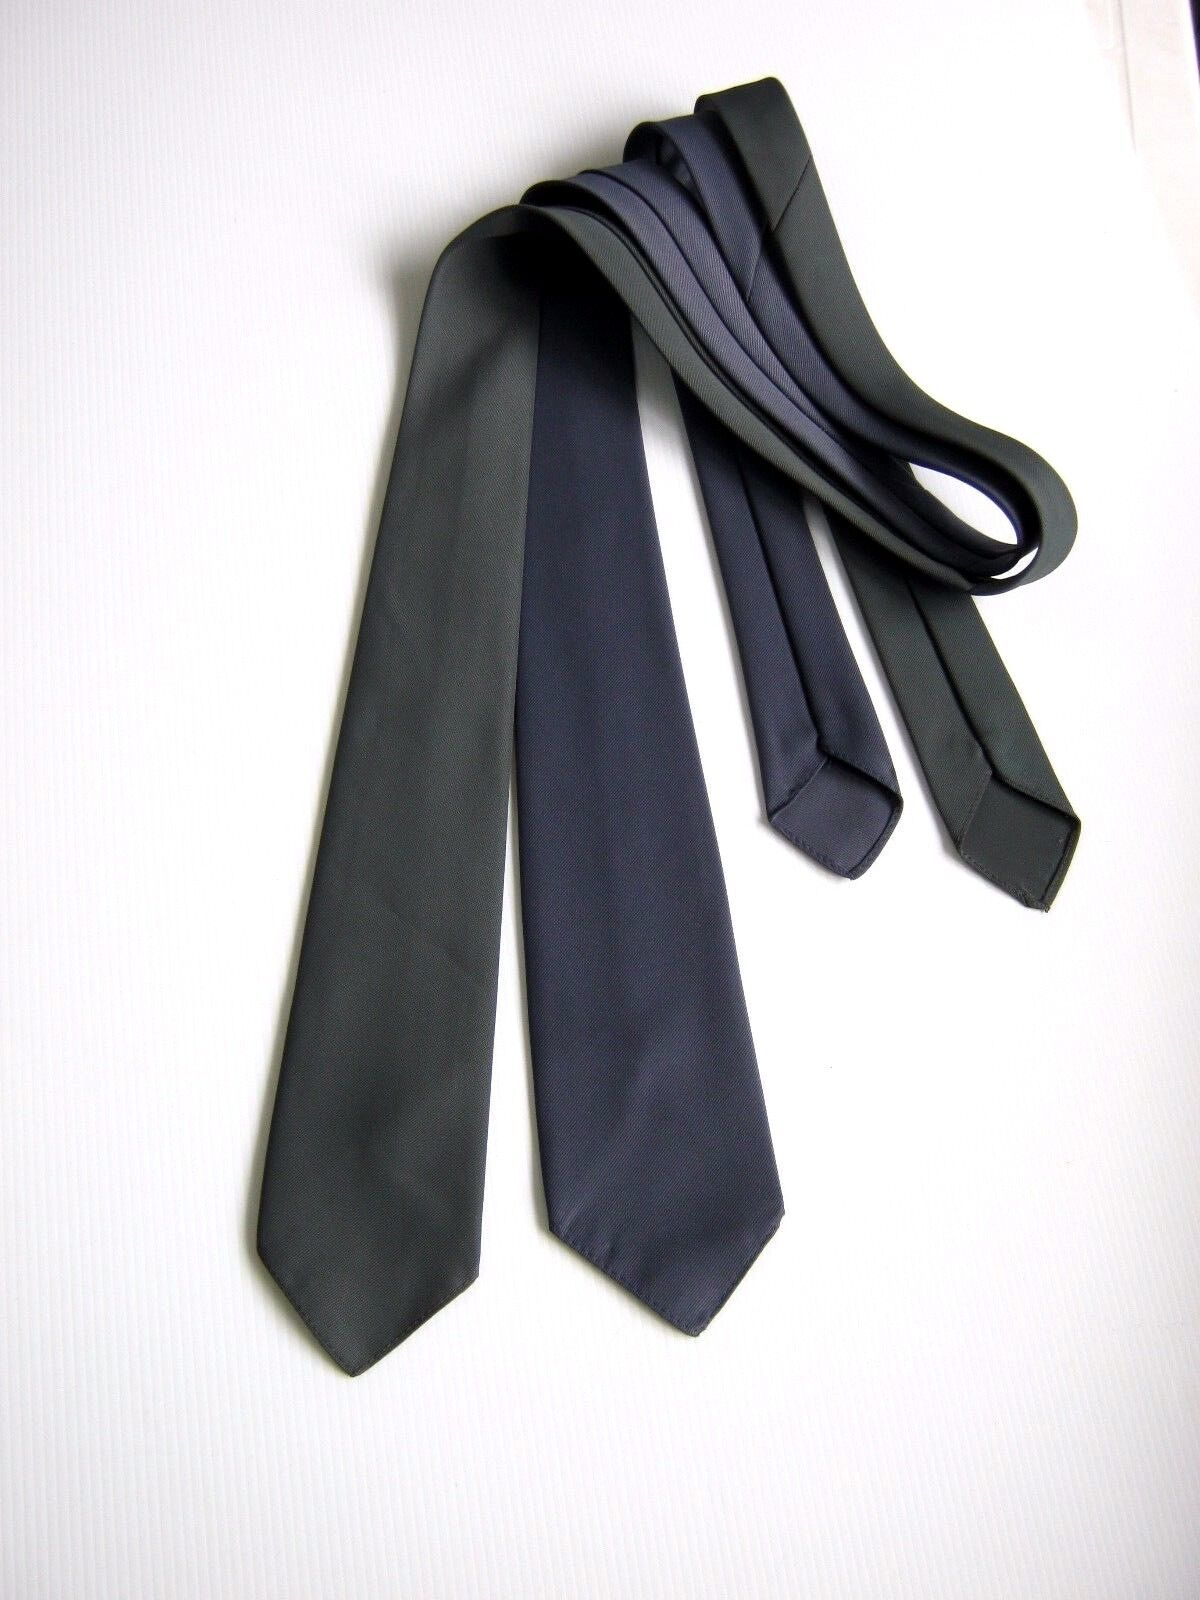 2 X Schlips Krawatten DANIEL MILANO Made IN Italy Vintage 80 Ovp